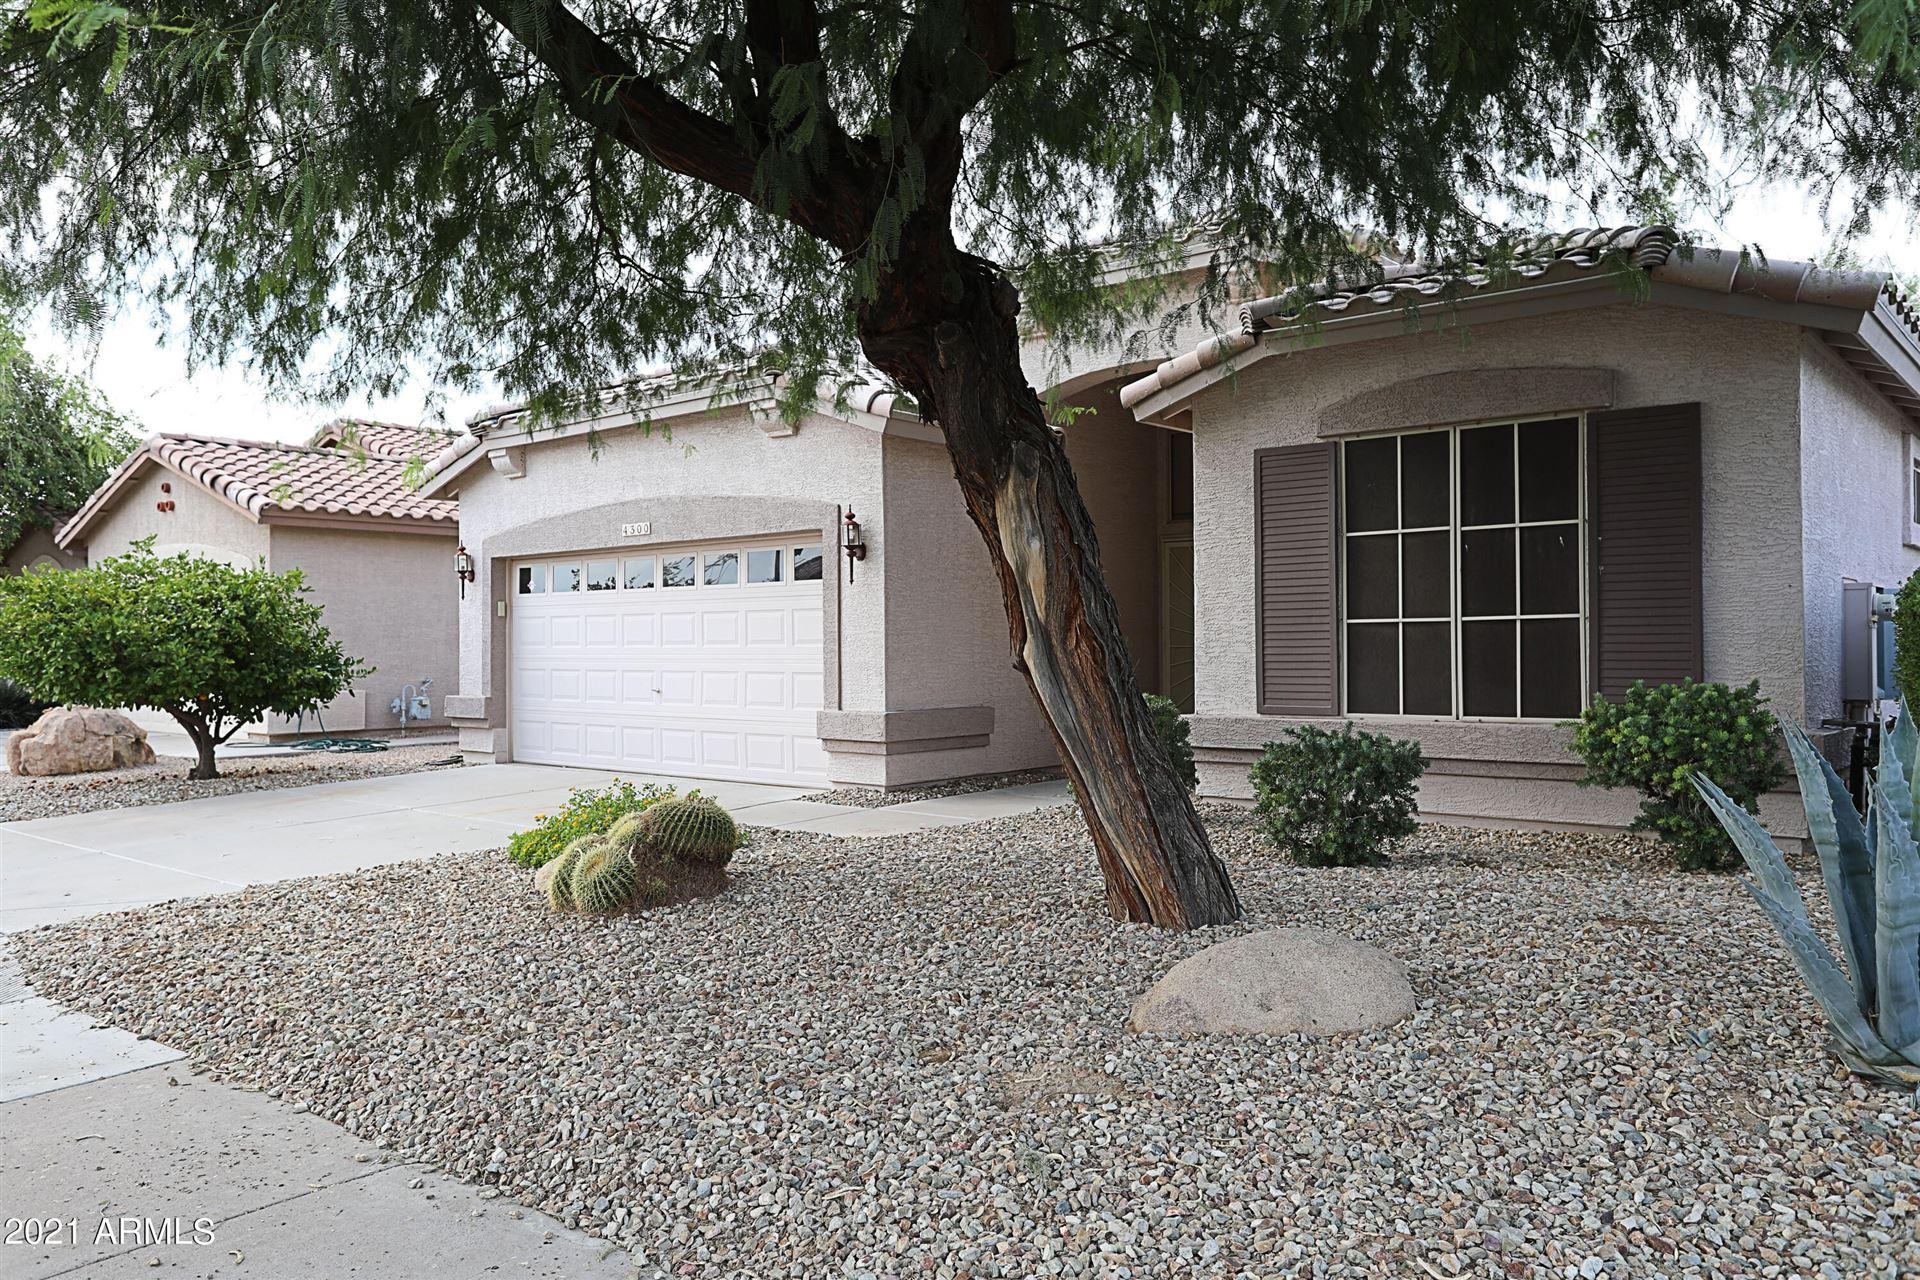 4300 E WALNUT Road, Gilbert, AZ 85298 - MLS#: 6265741